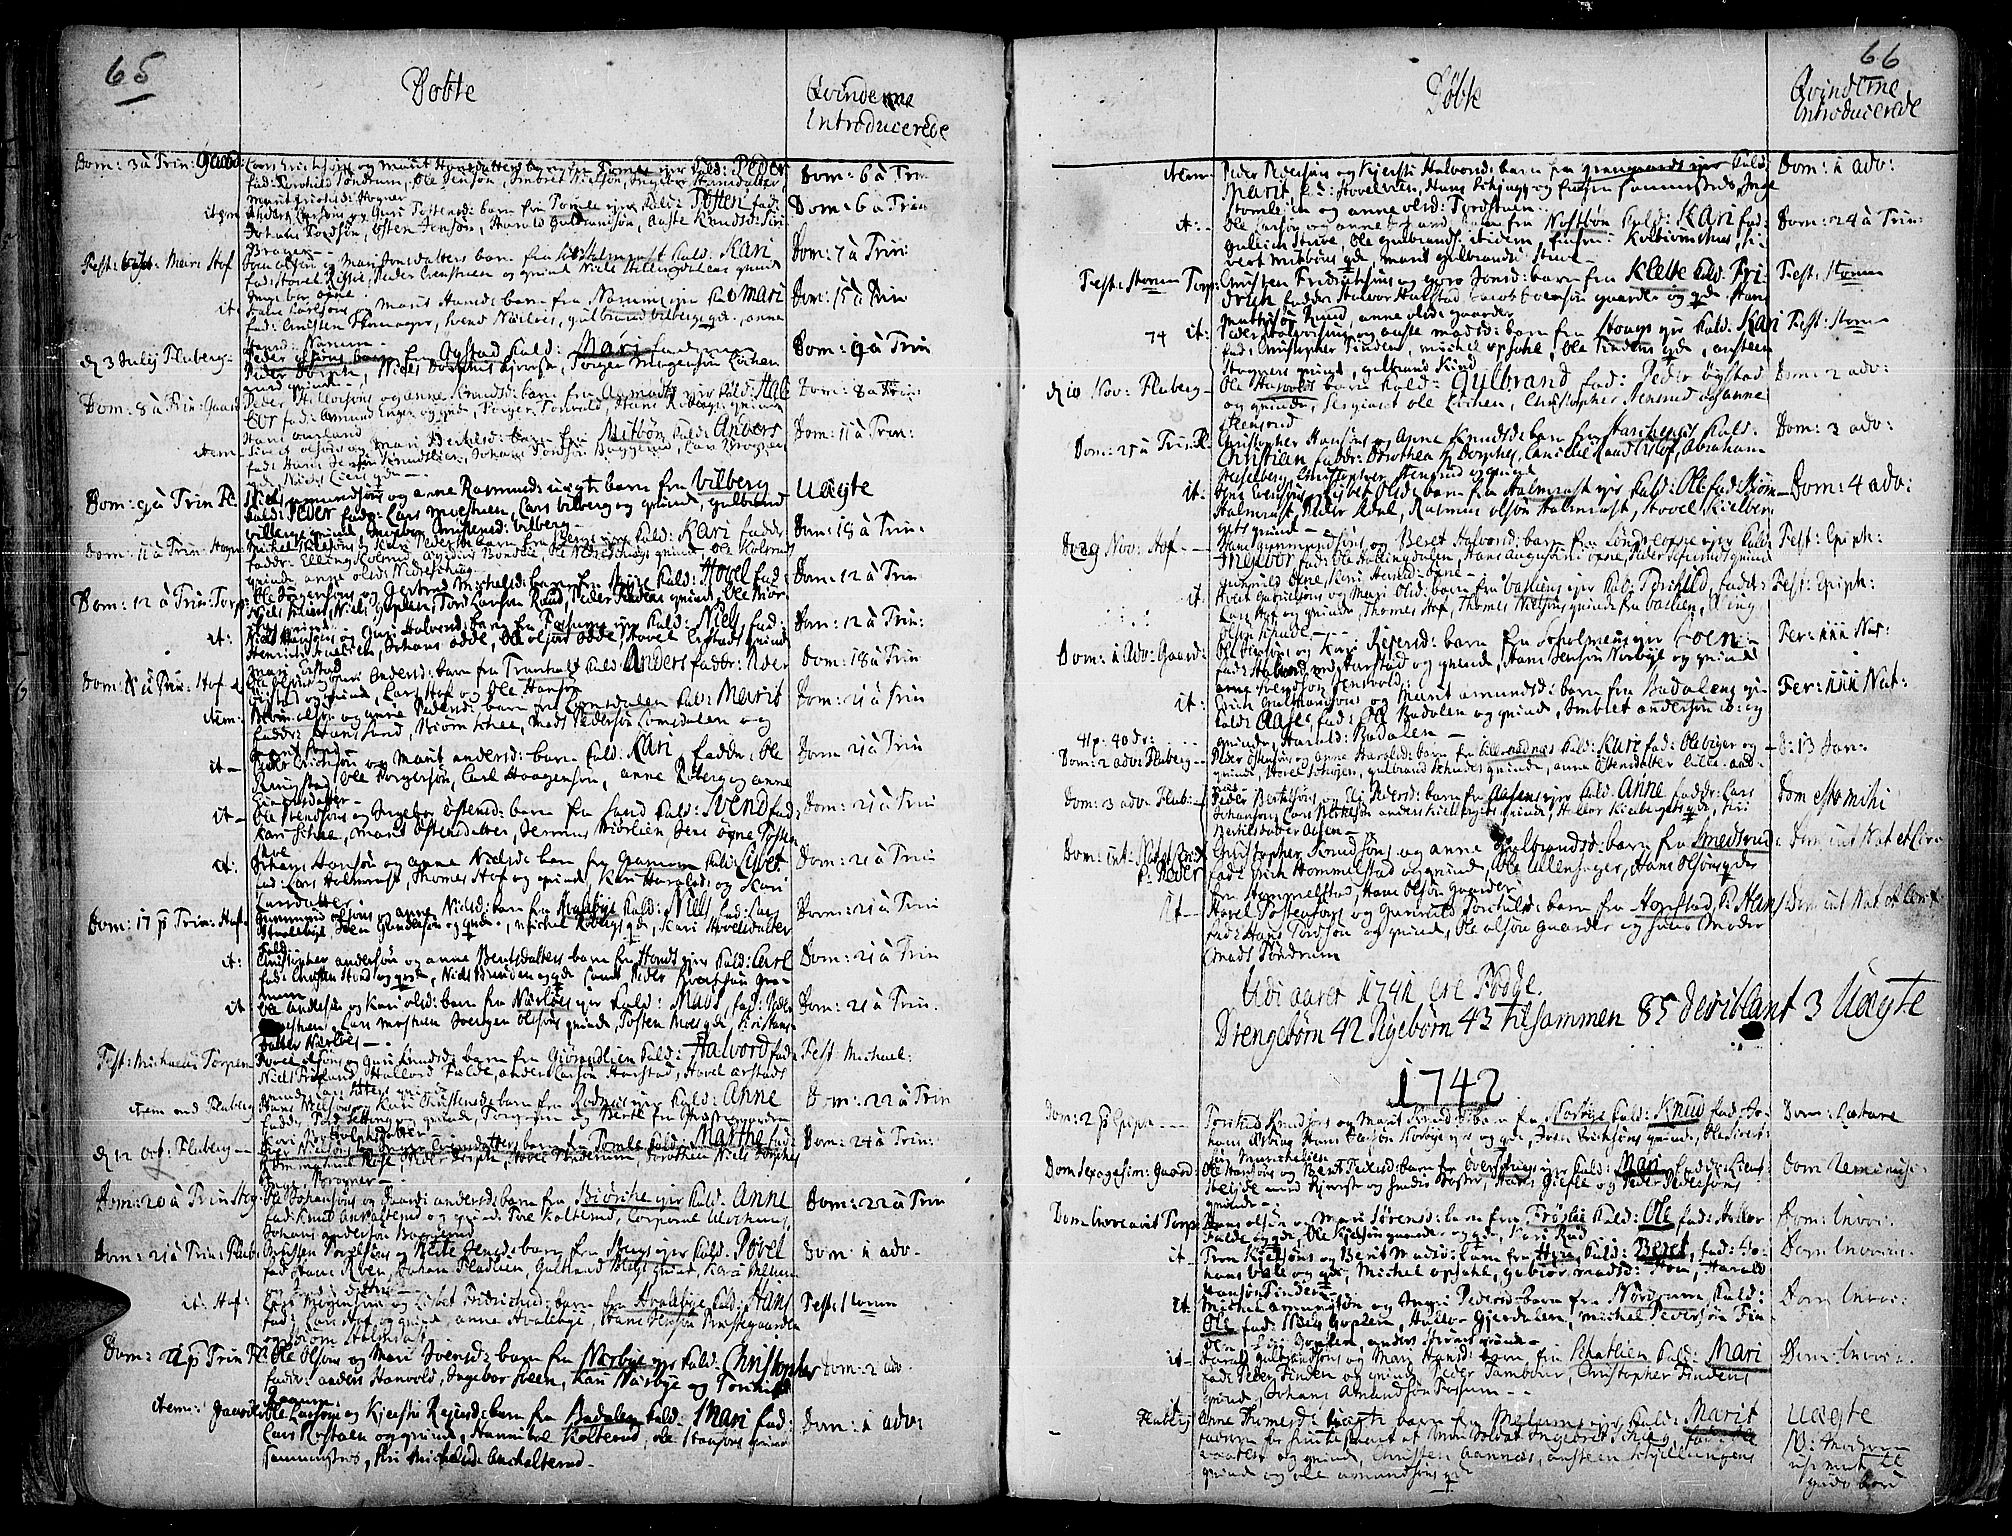 SAH, Land prestekontor, Ministerialbok nr. 2, 1733-1764, s. 65-66